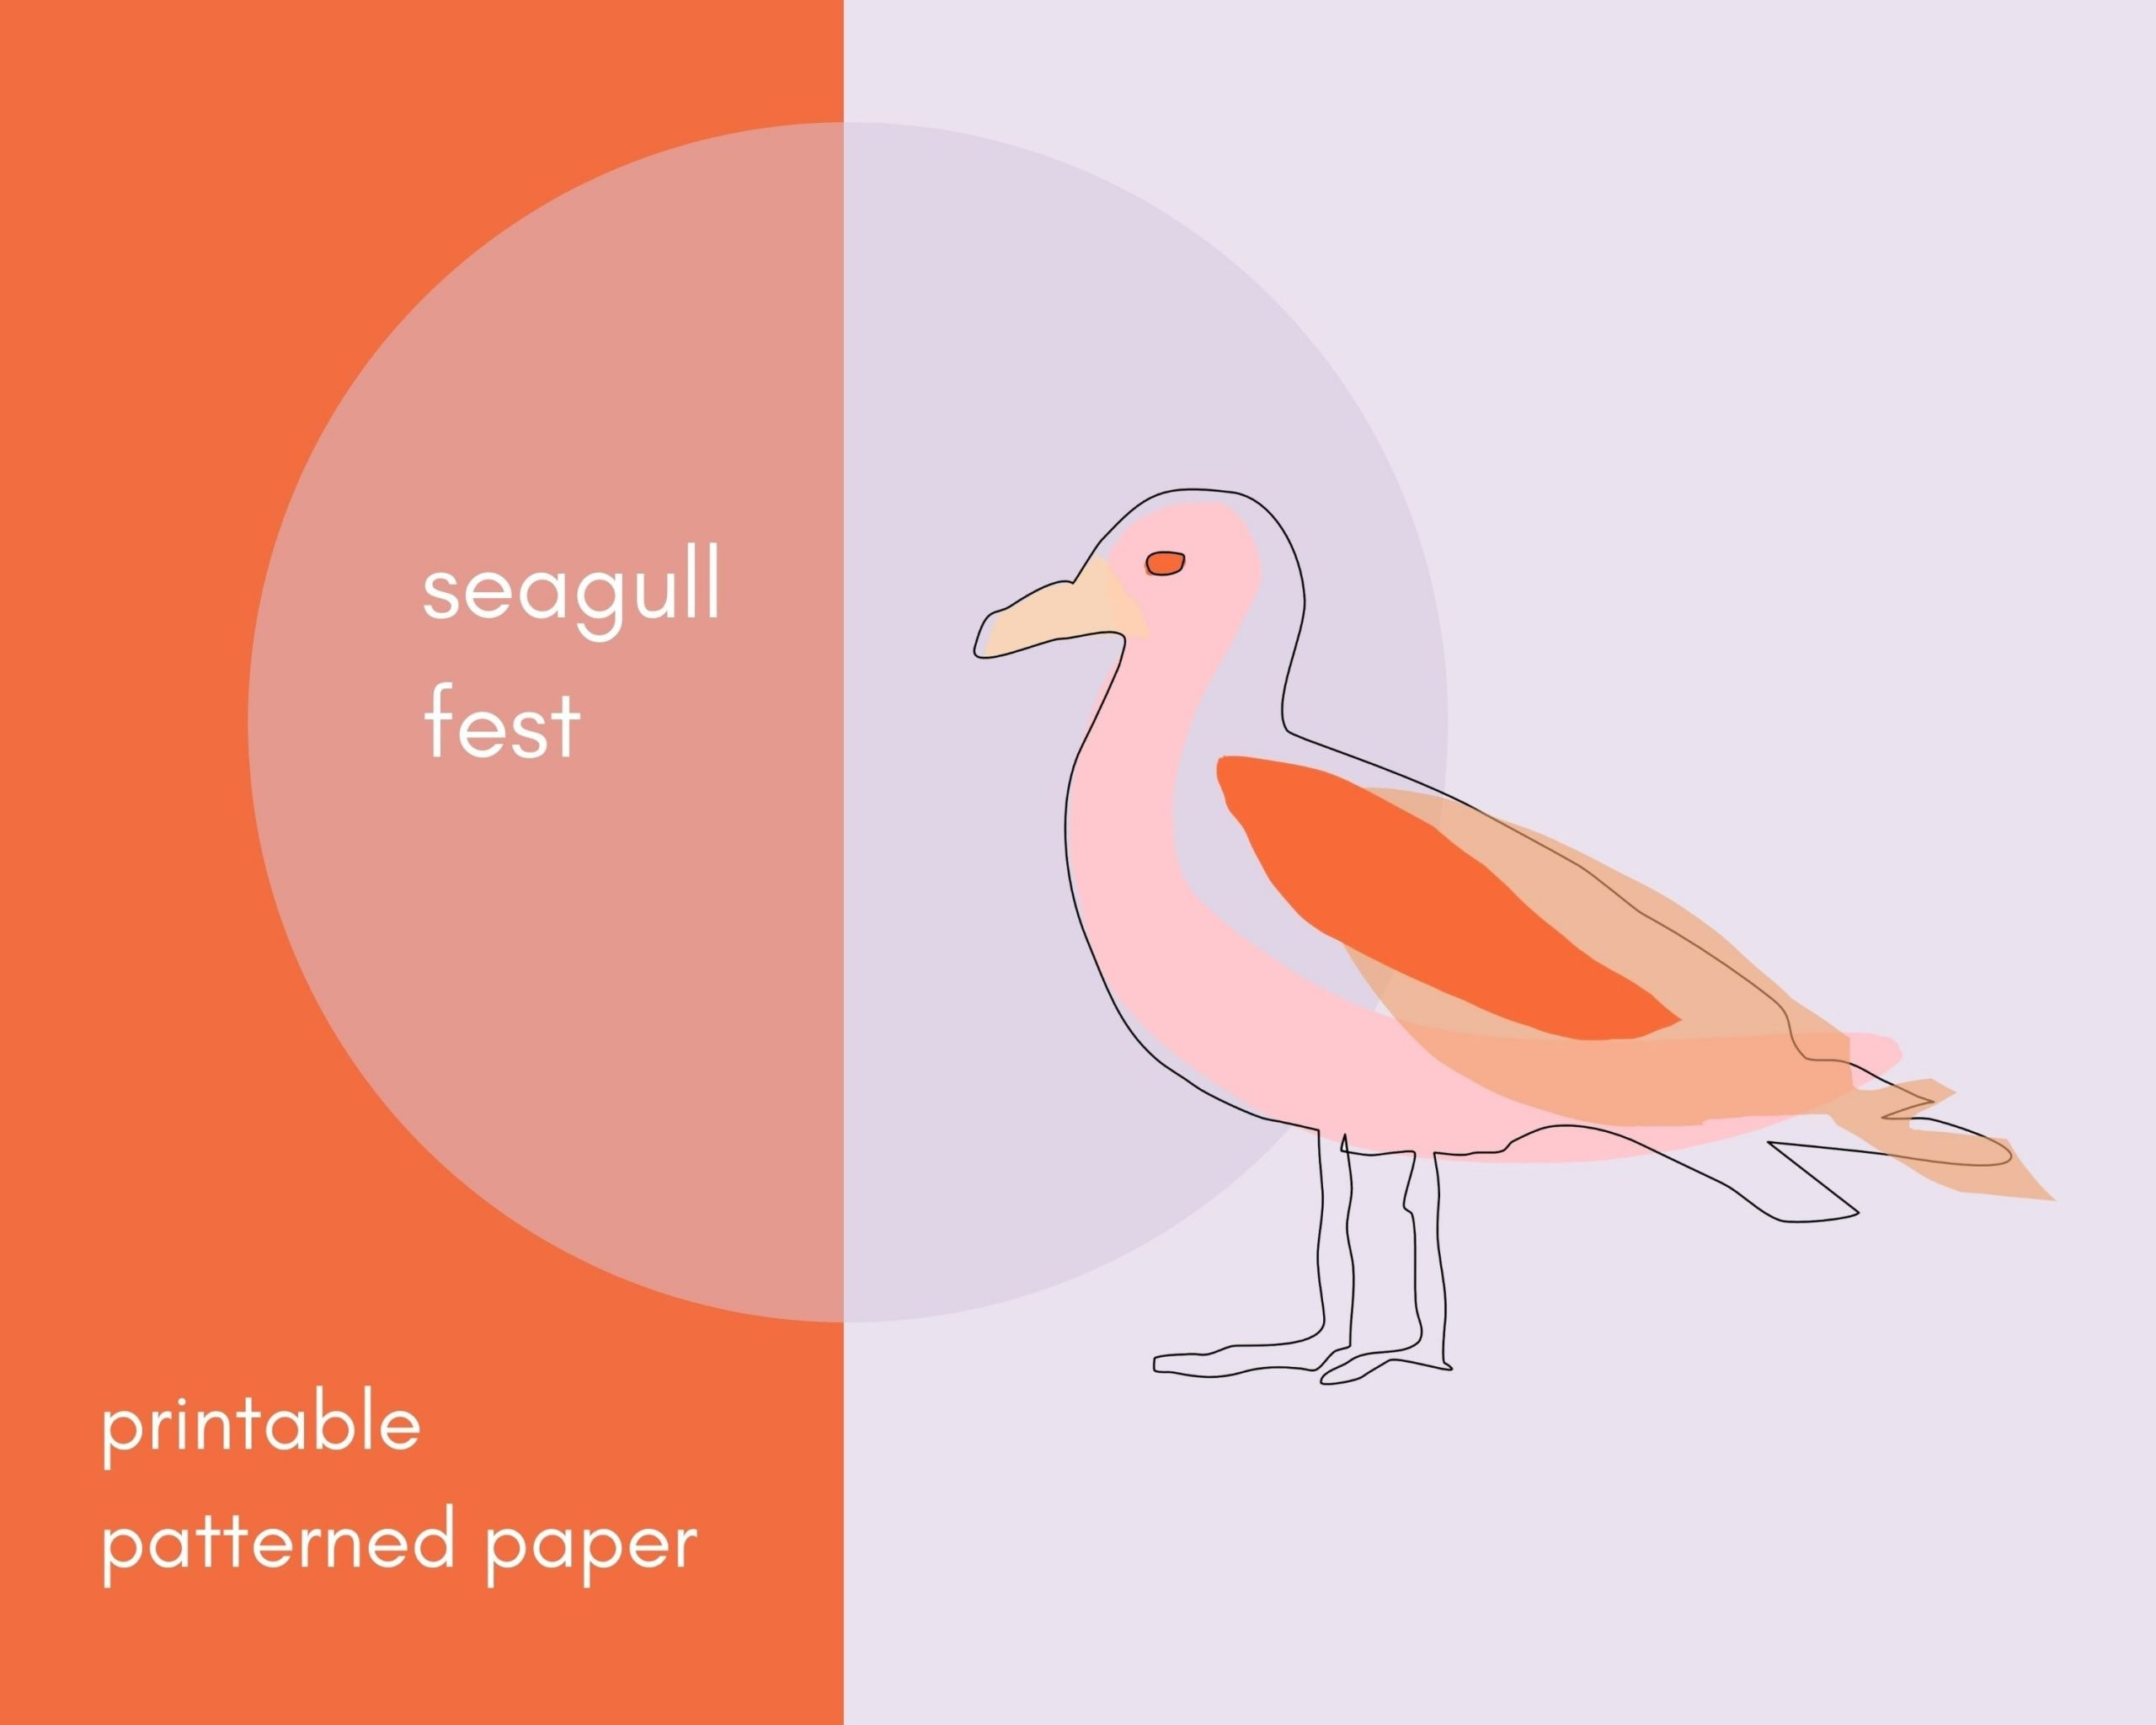 Seagull Fest Printable Paper